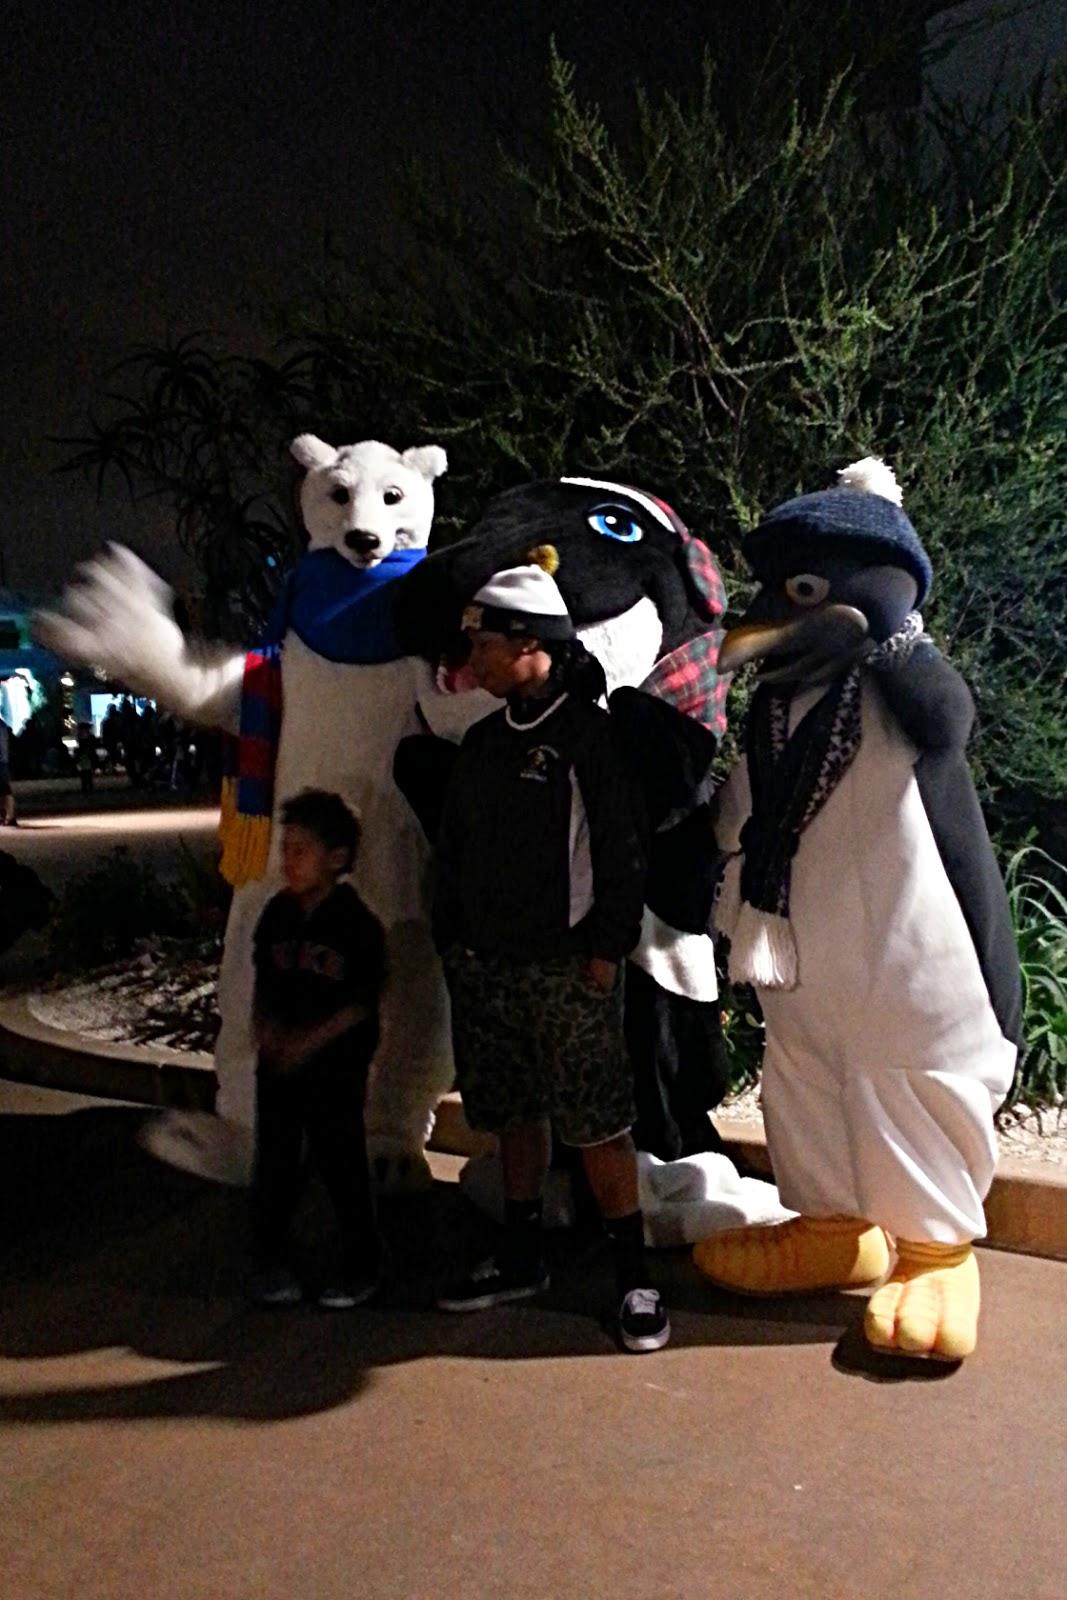 The festive and family fun christmas celebration at seaworld san diego